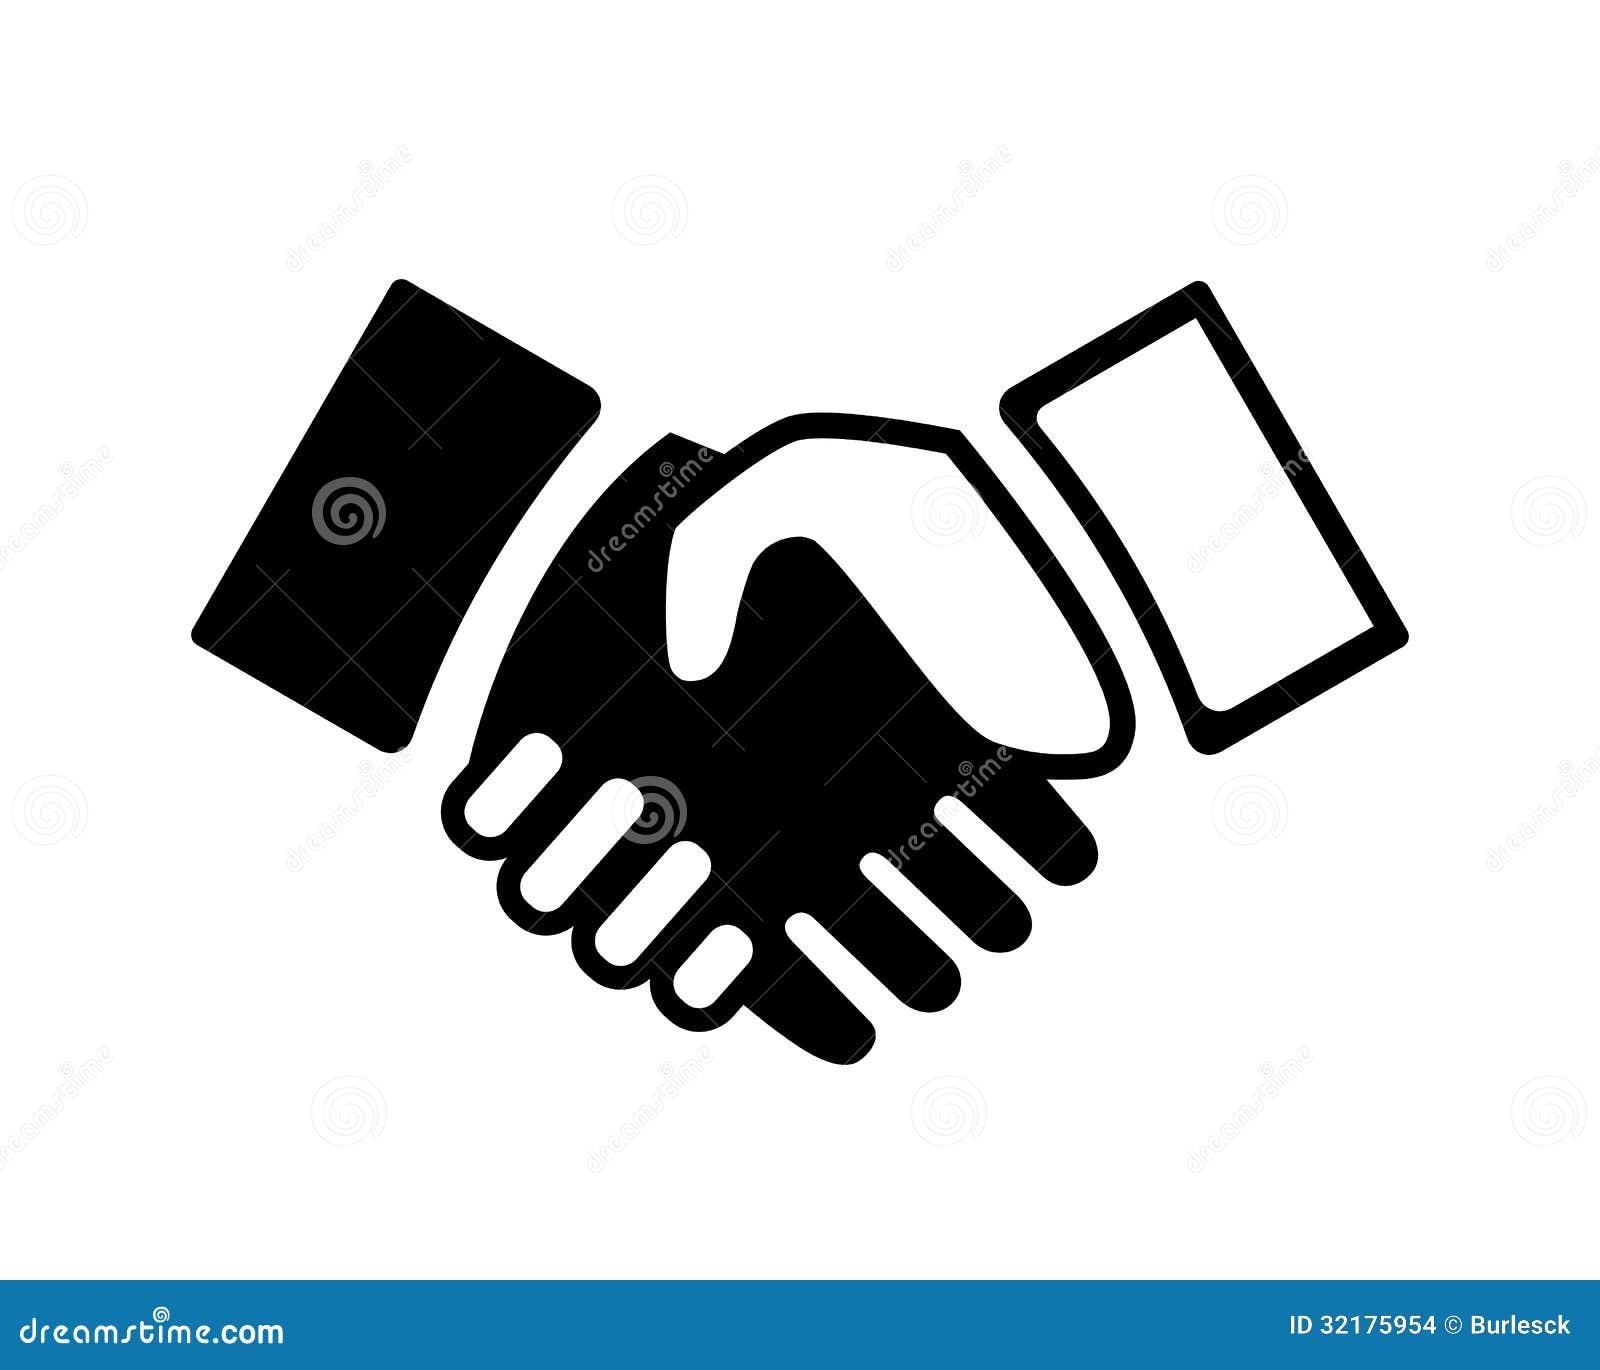 Handshake Stock Images - Image: 32175954